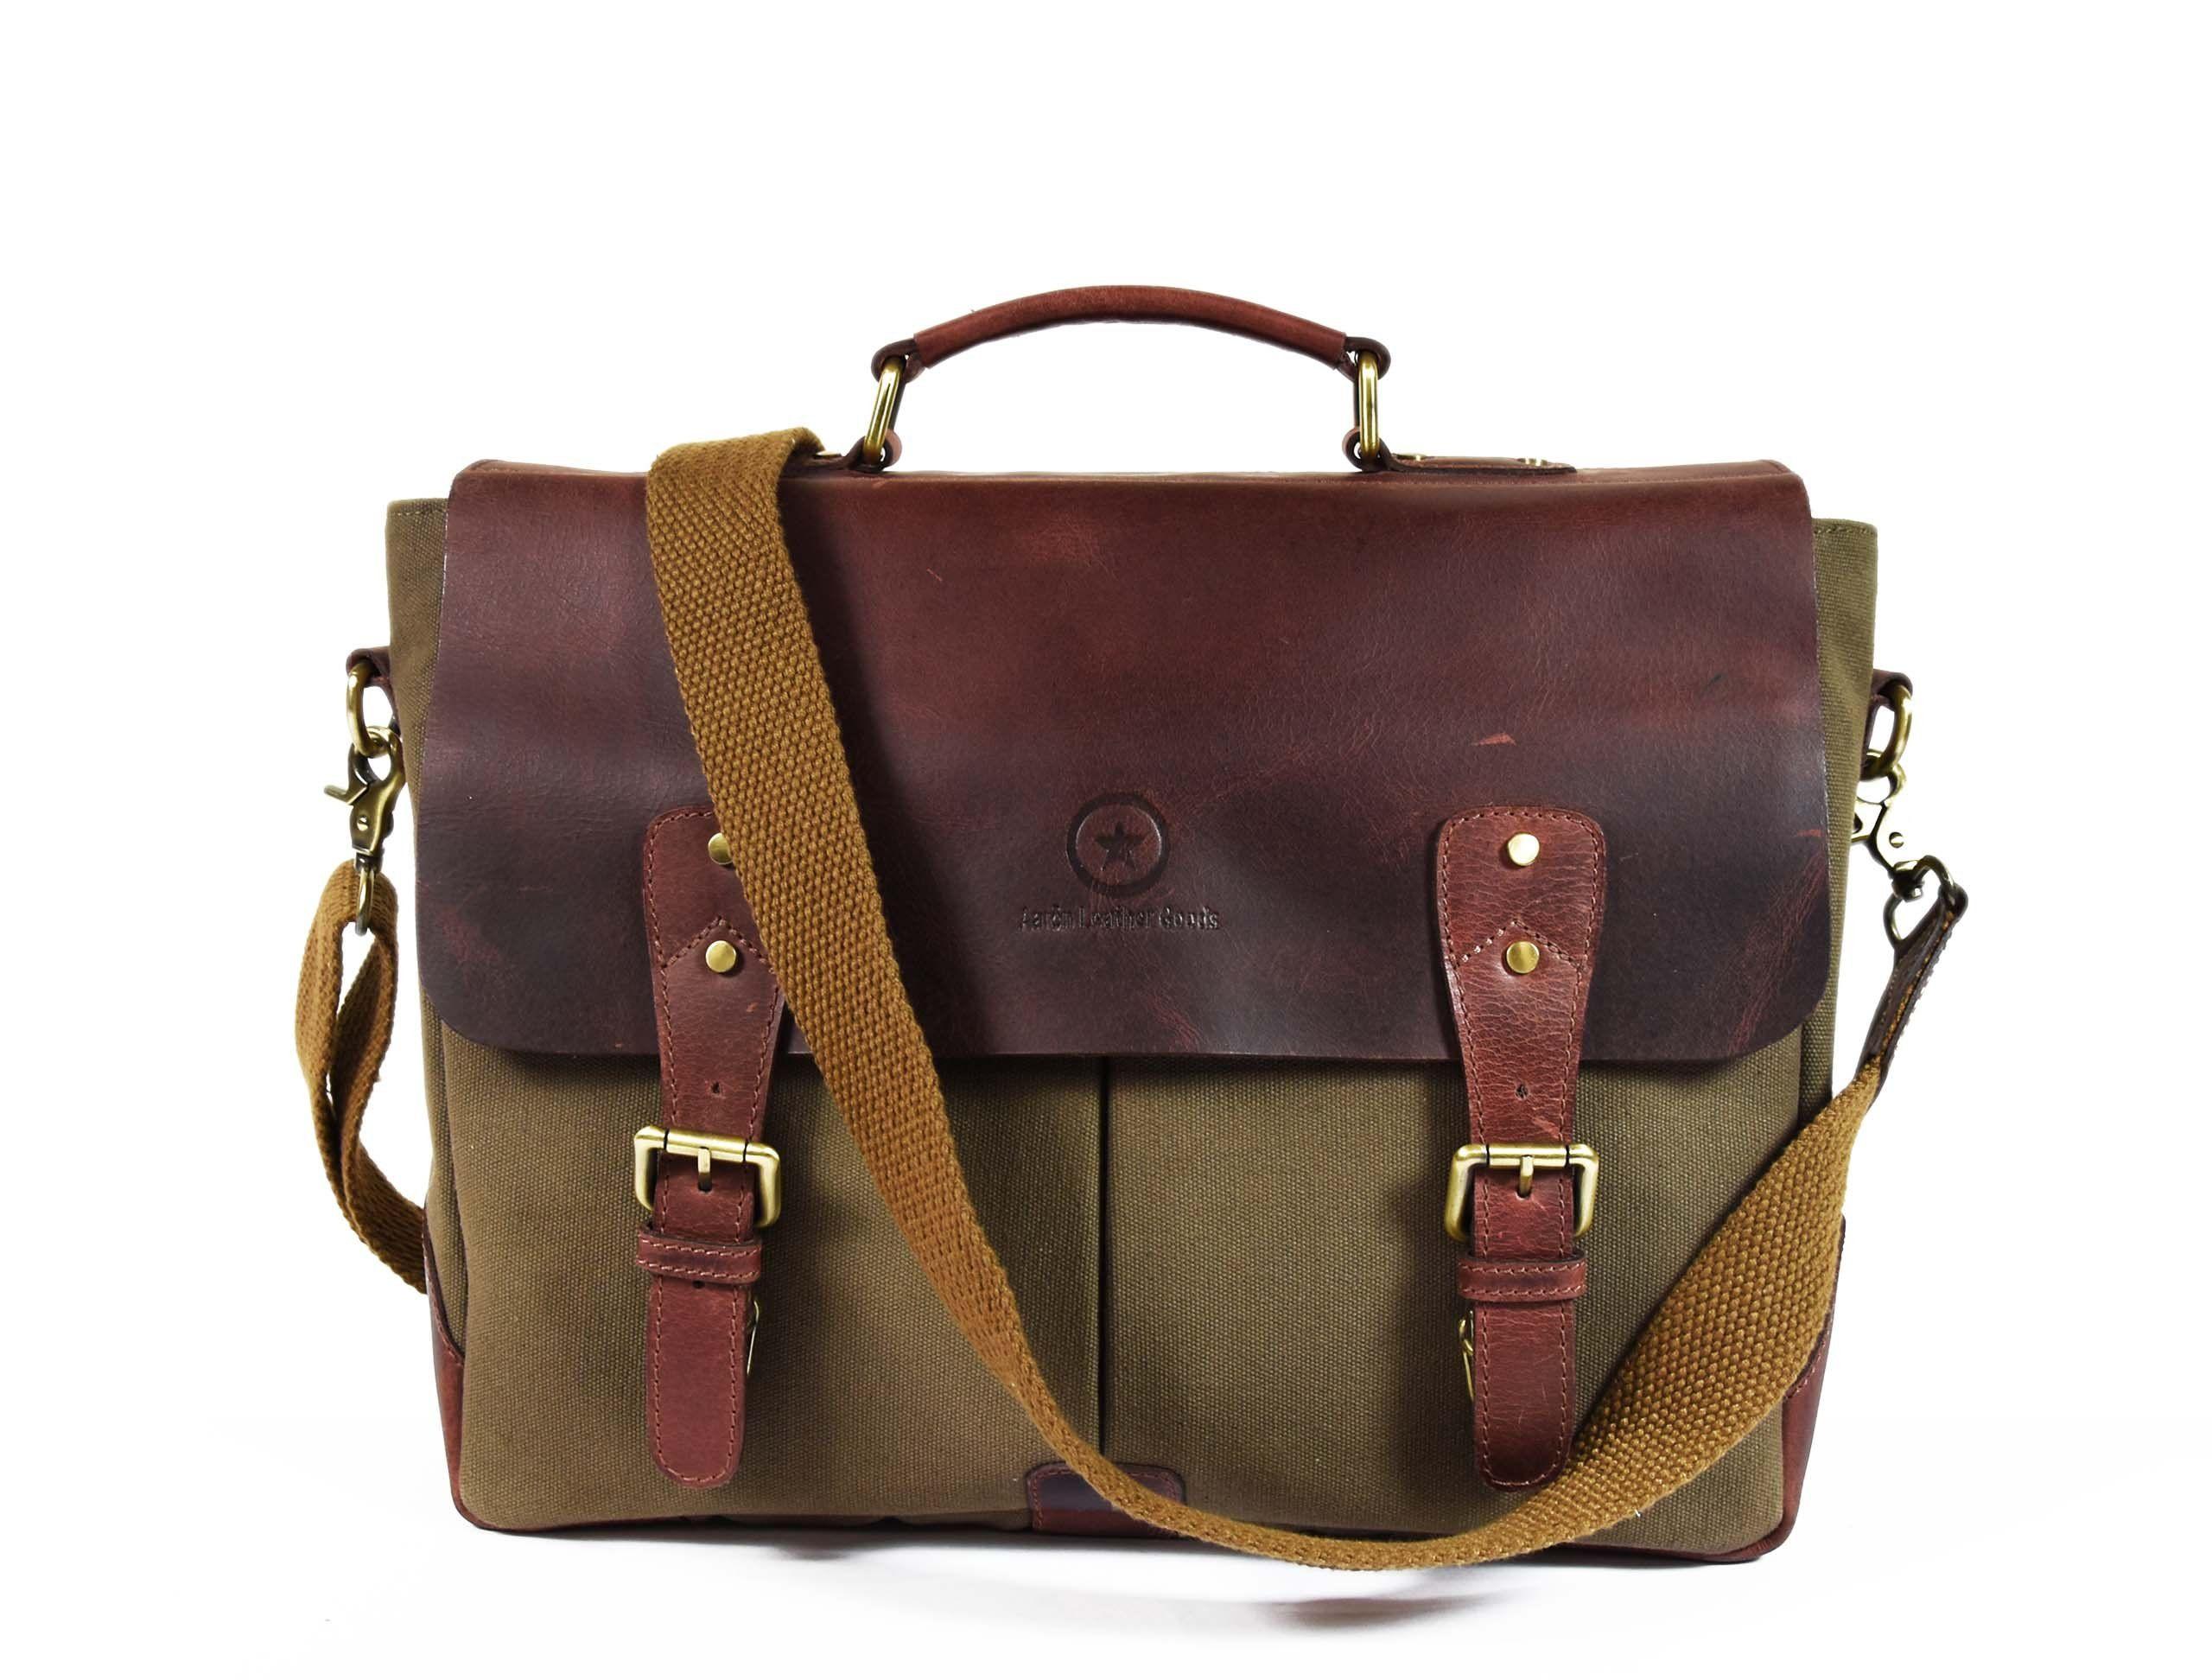 1aab5f3bc5 Handmade Vintage Leather Canvas Crossbody Messenger Bag